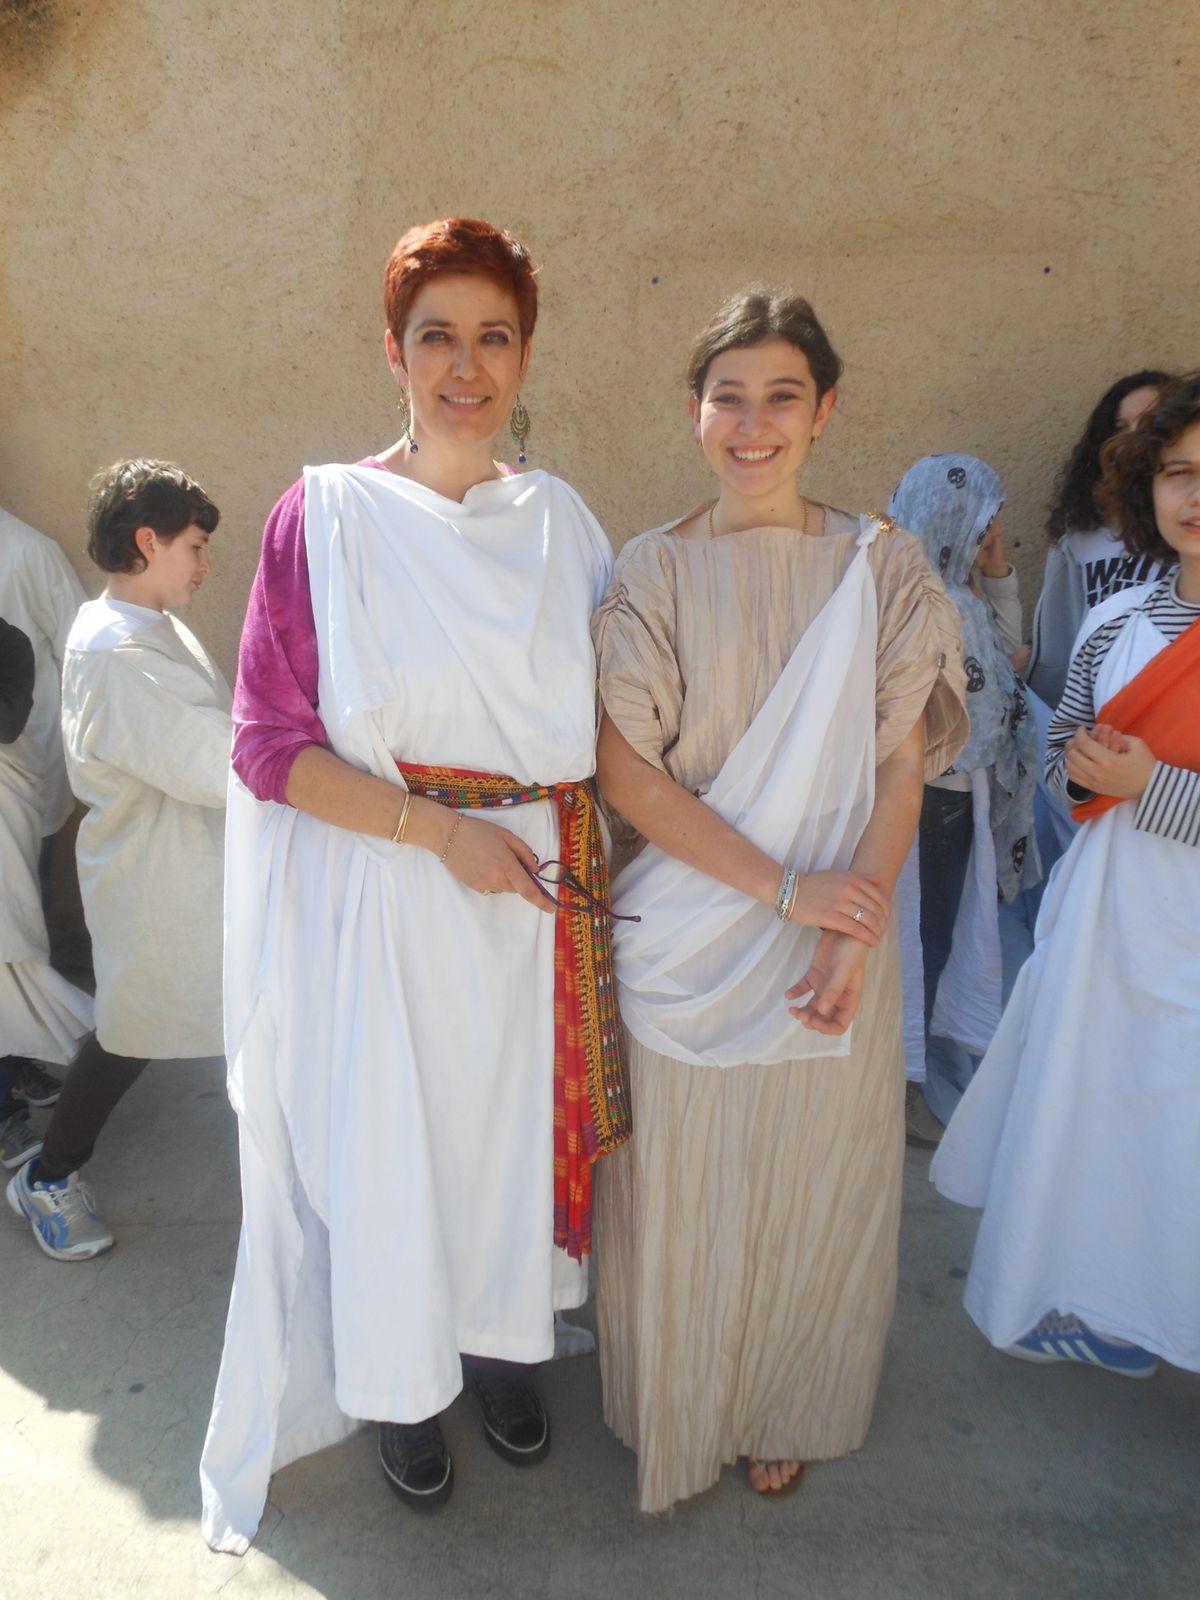 La journée romaine au collège